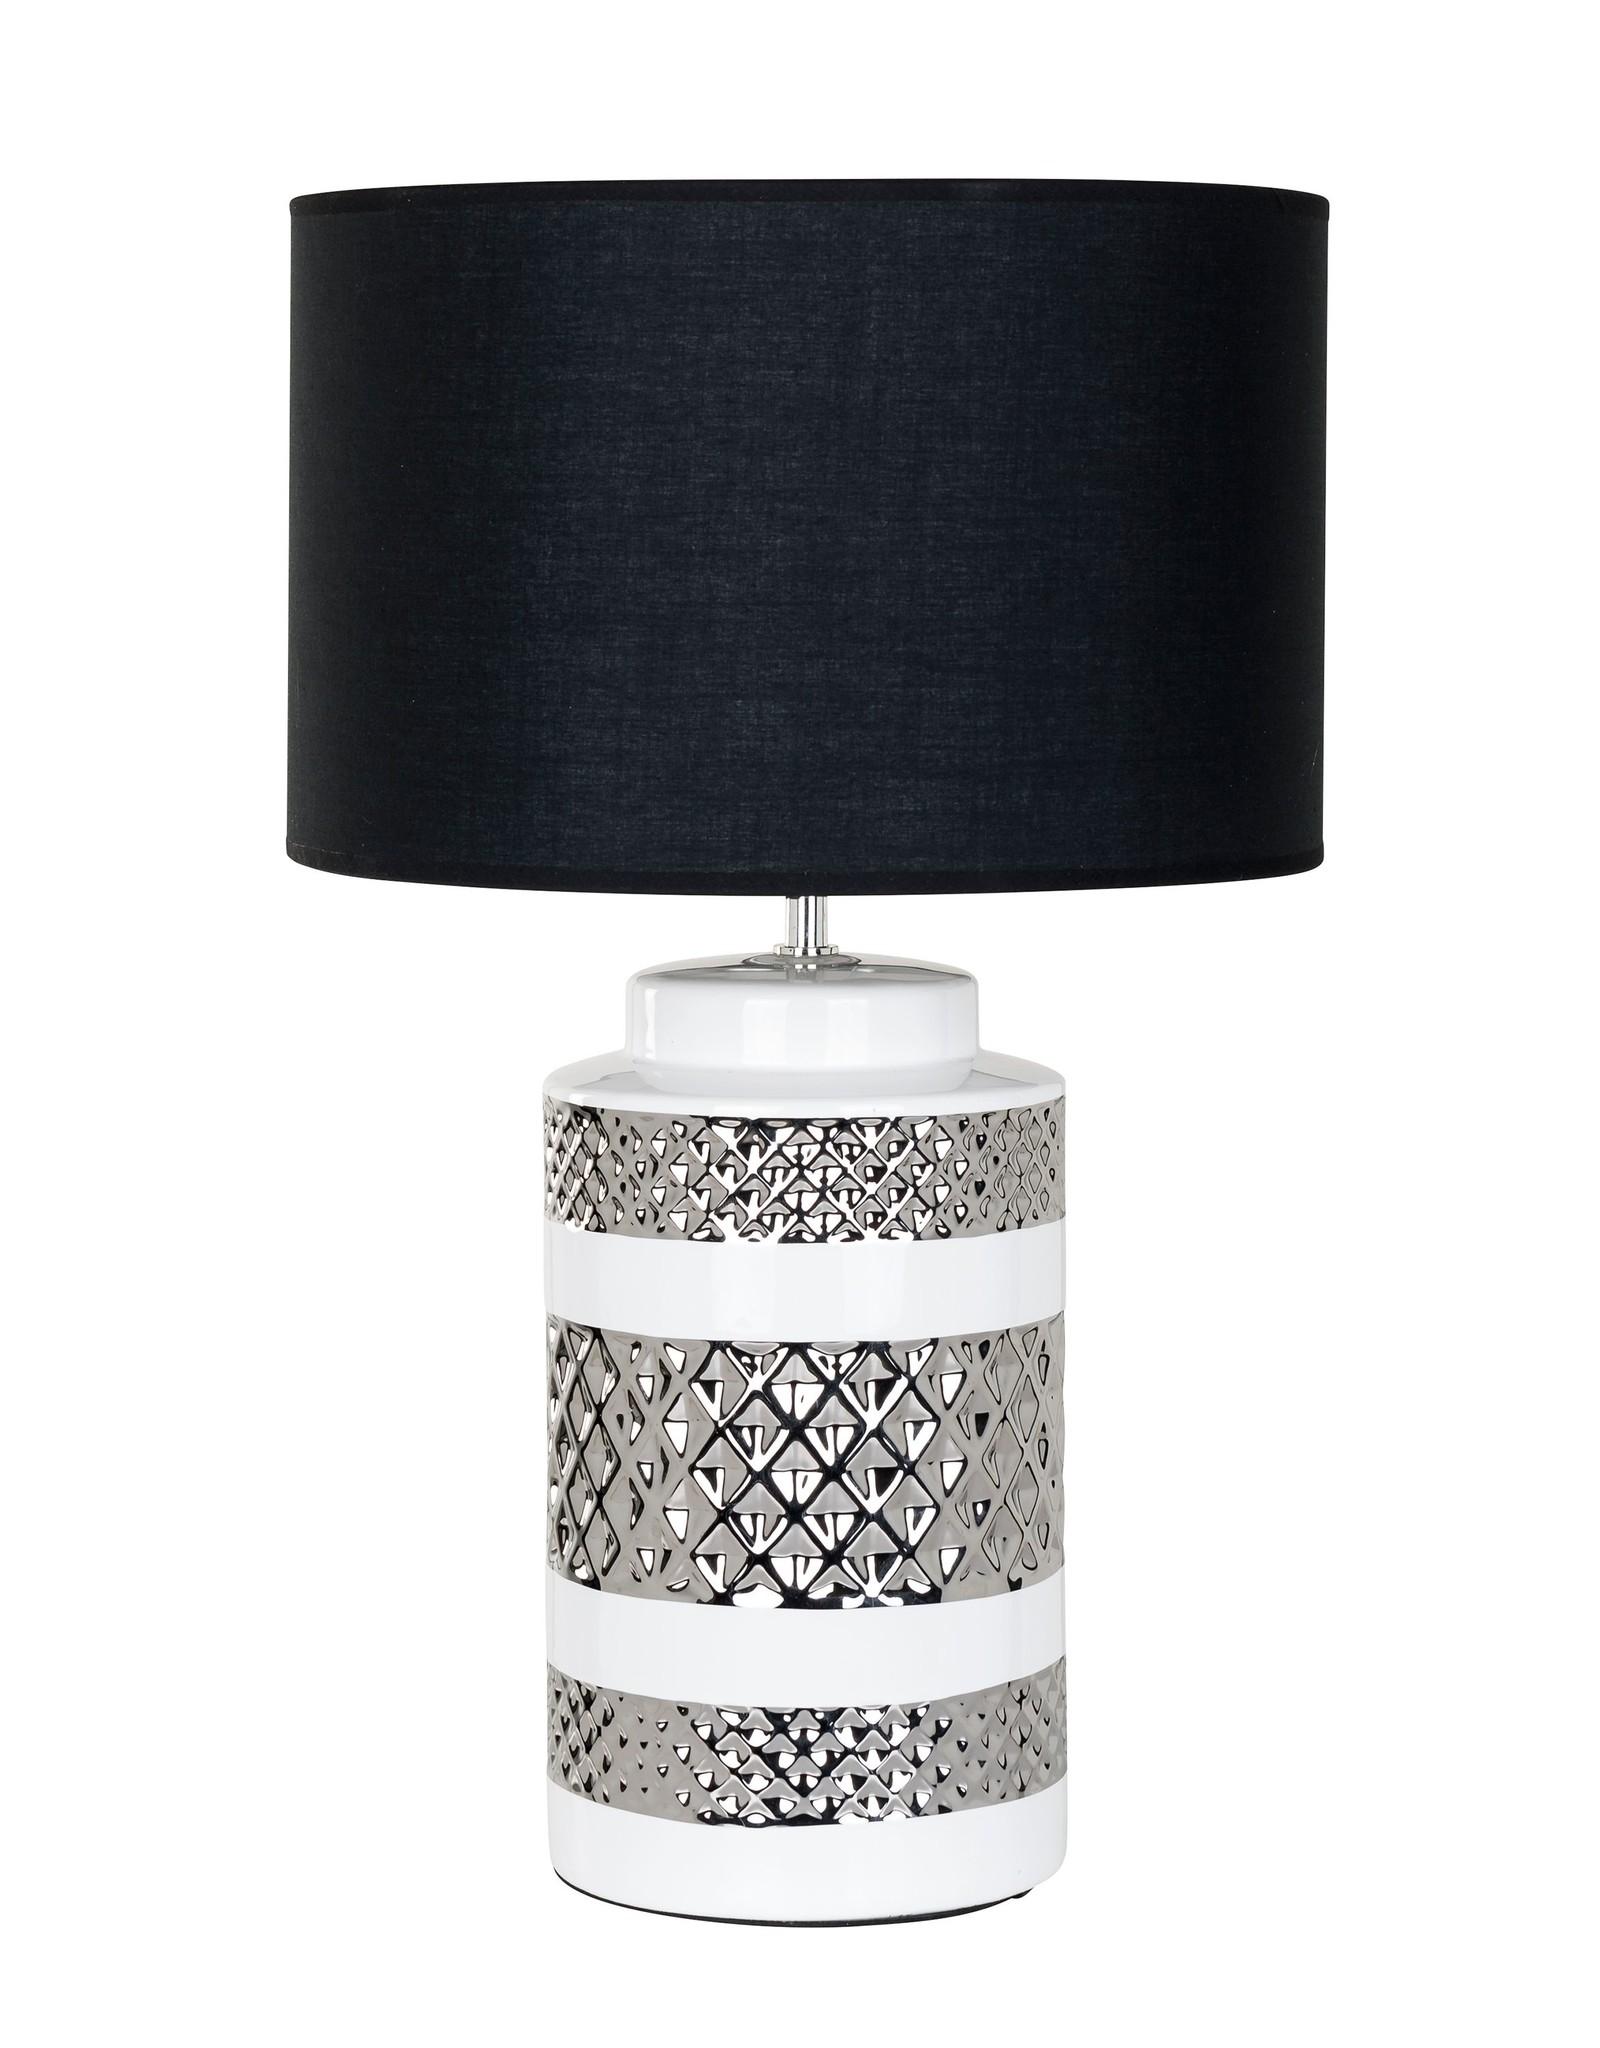 Richmond Interiors Tafellamp Aurora incl. lampenkap zwart